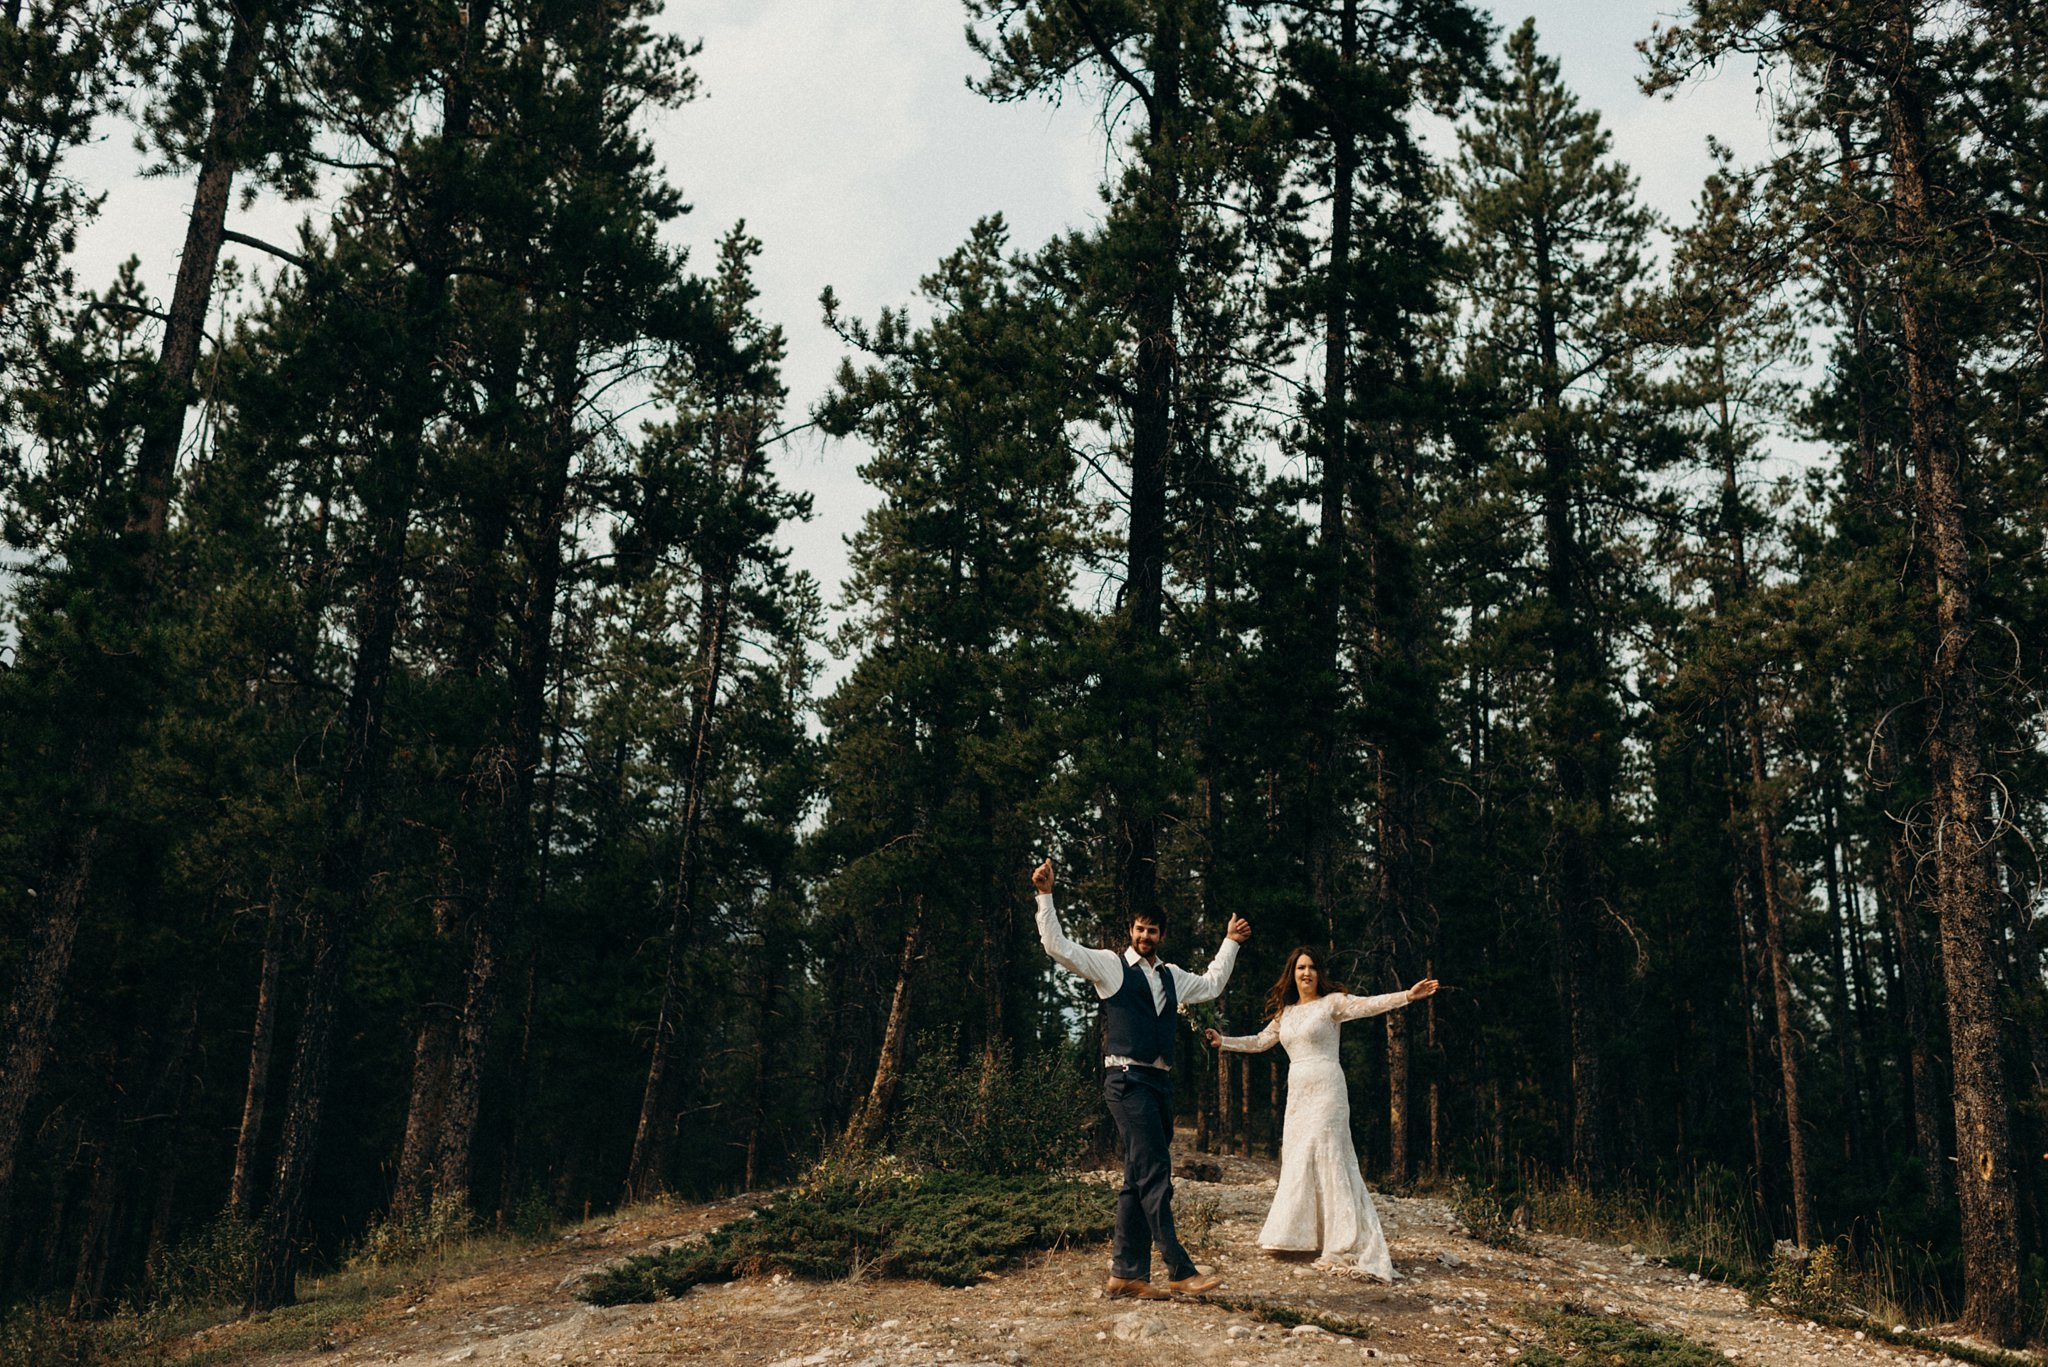 kaihla_tonai_intimate_wedding_elopement_photographer_6729.jpg